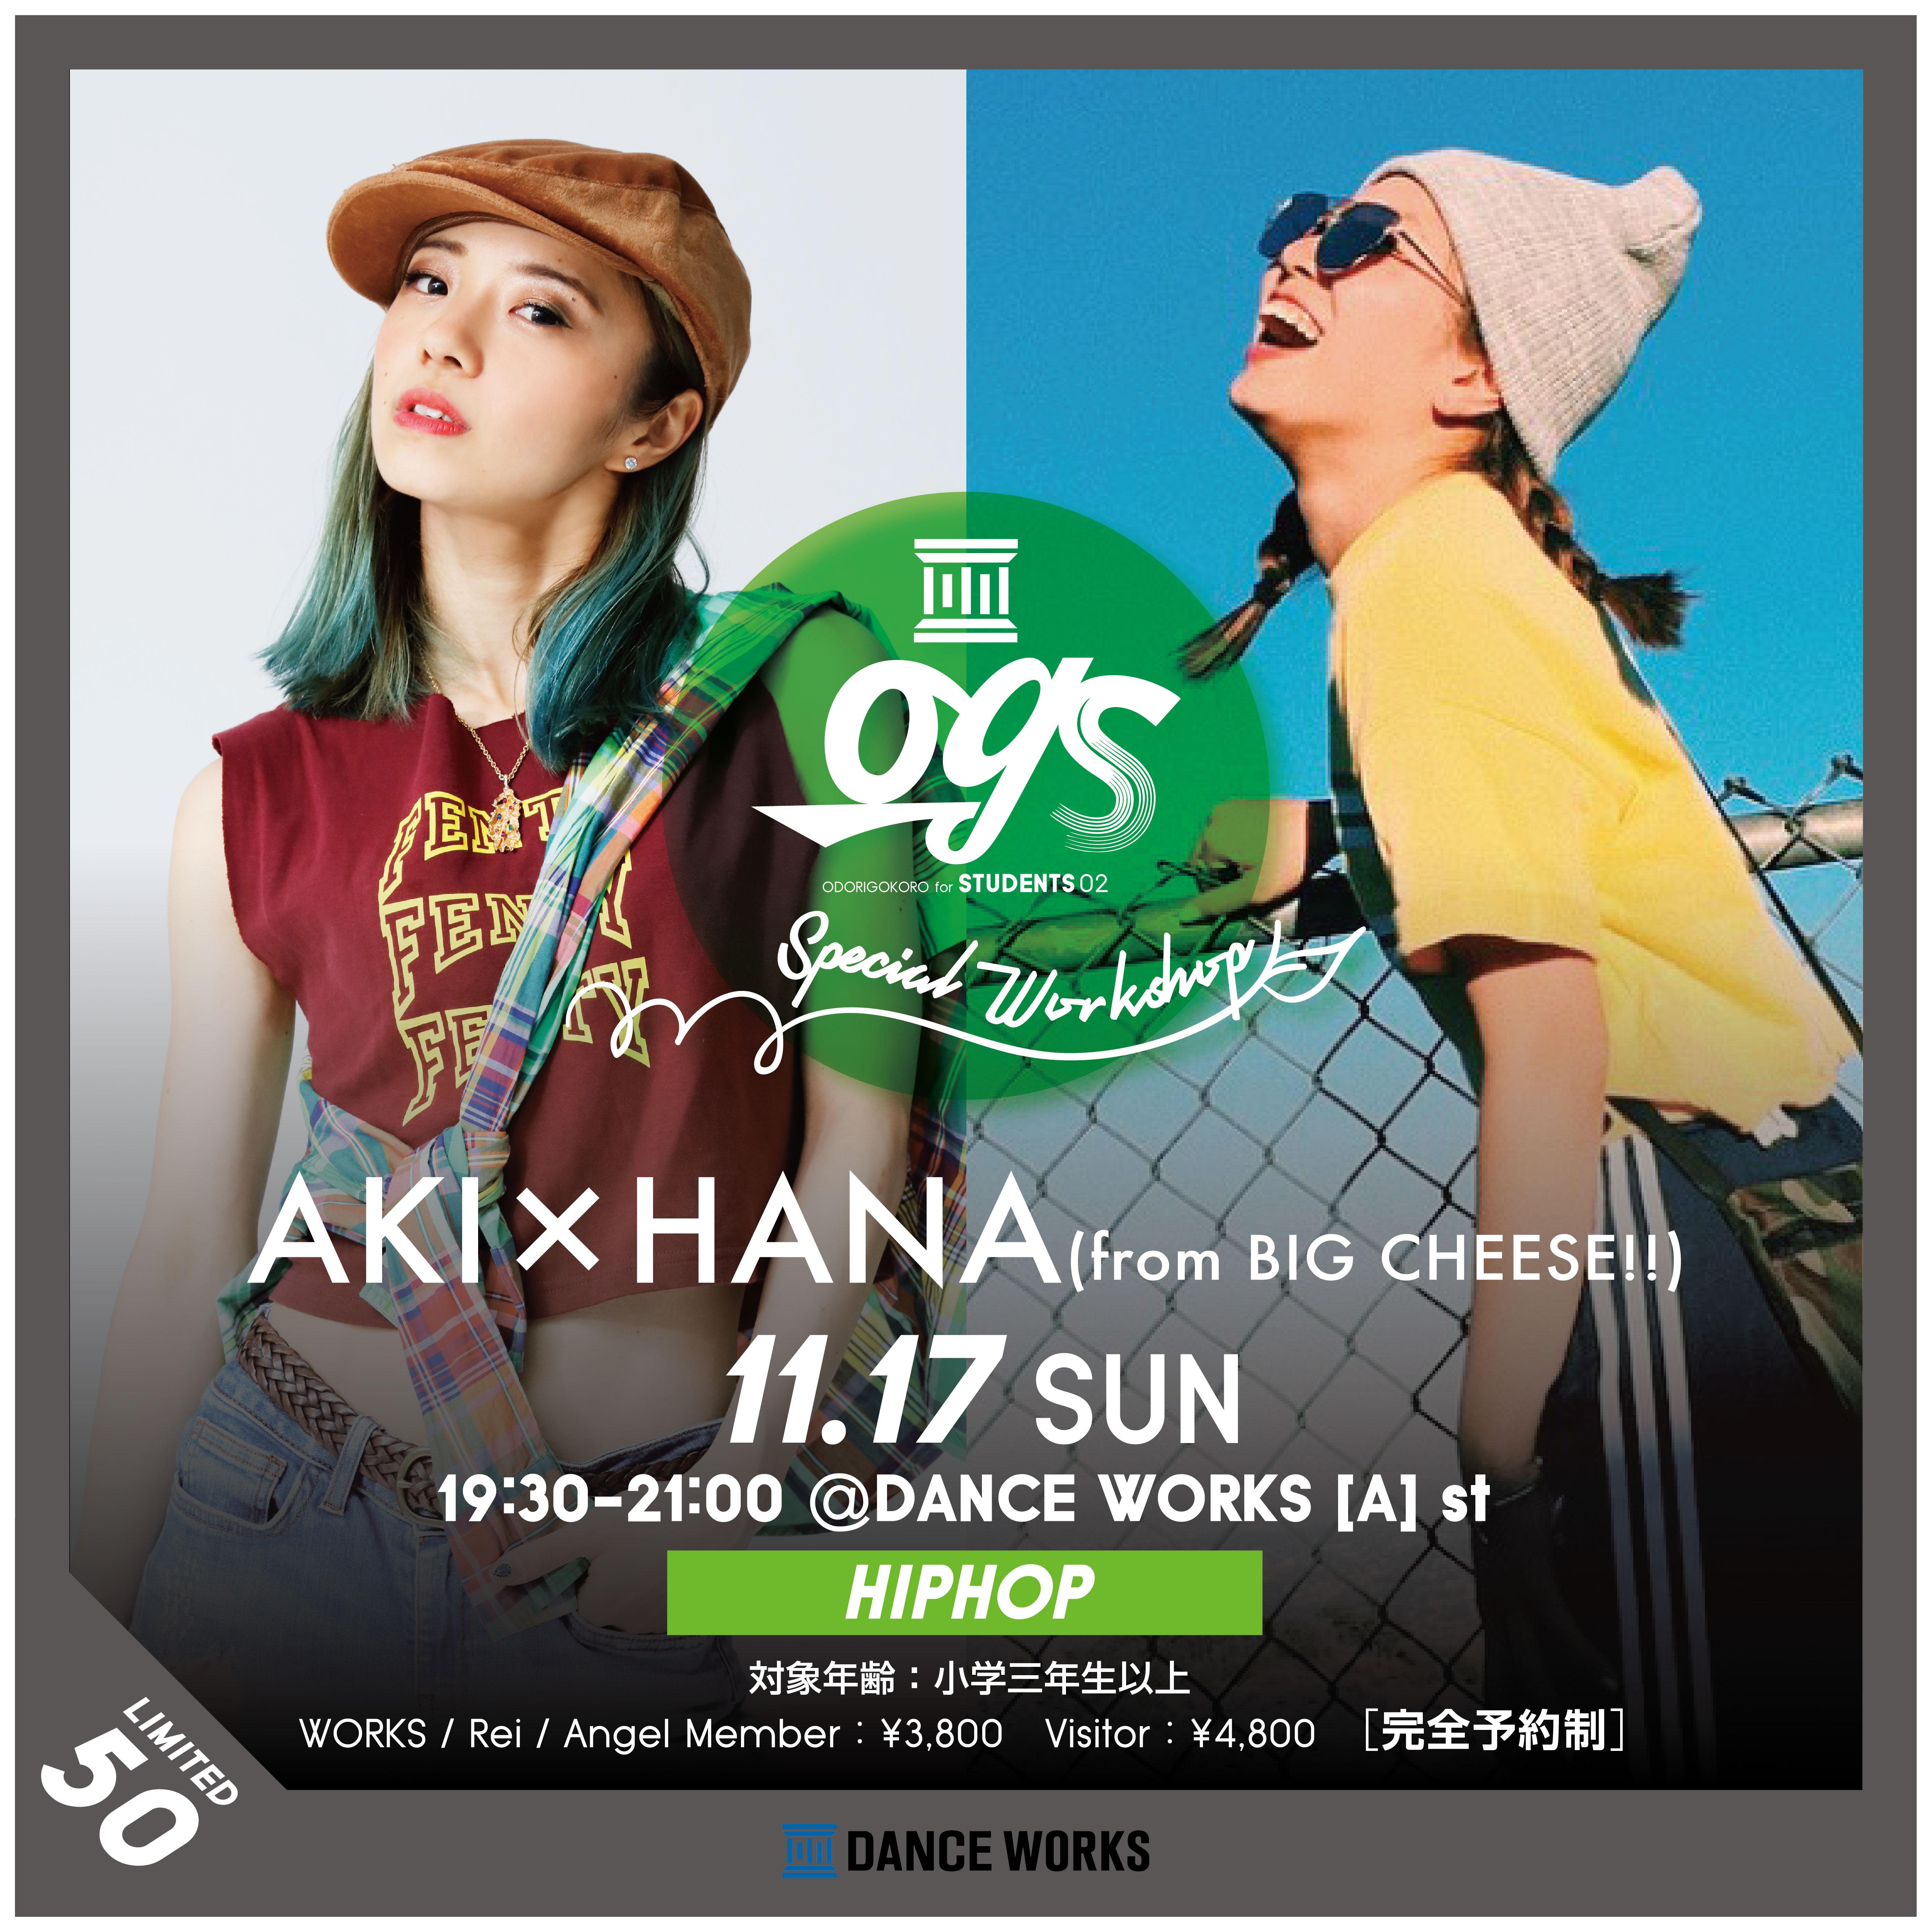 【AKI+HANA(from BIG CHEESE!!)】ダンスワークショップ開催!!